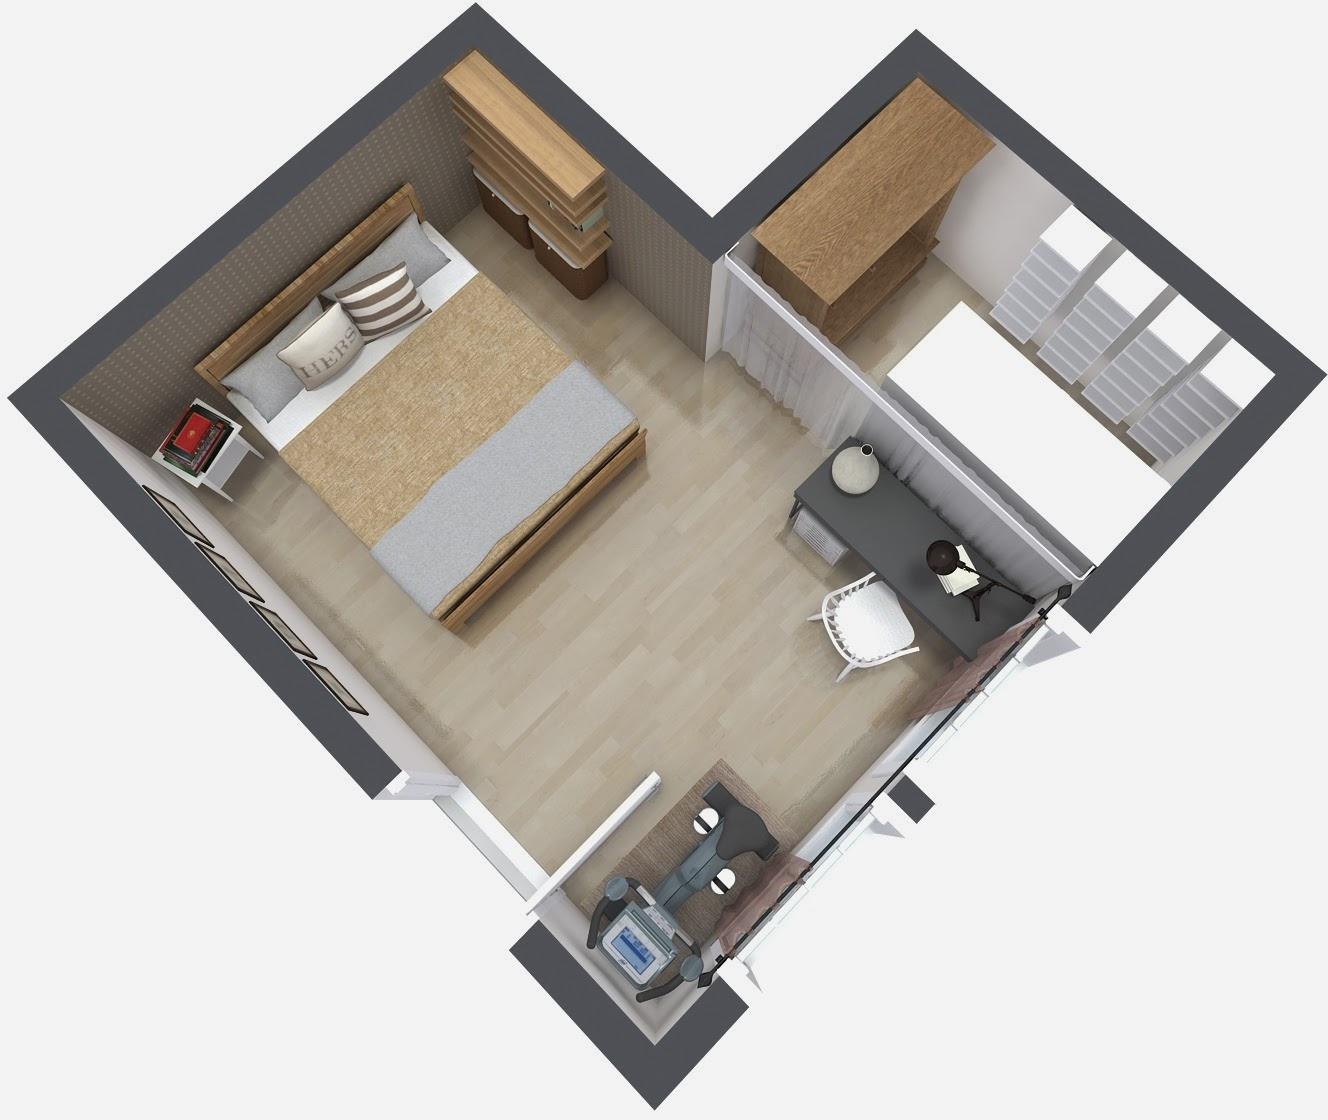 Raumplaner 3d simple badezimmer d planer online design for Kostenloser 3d raumplaner